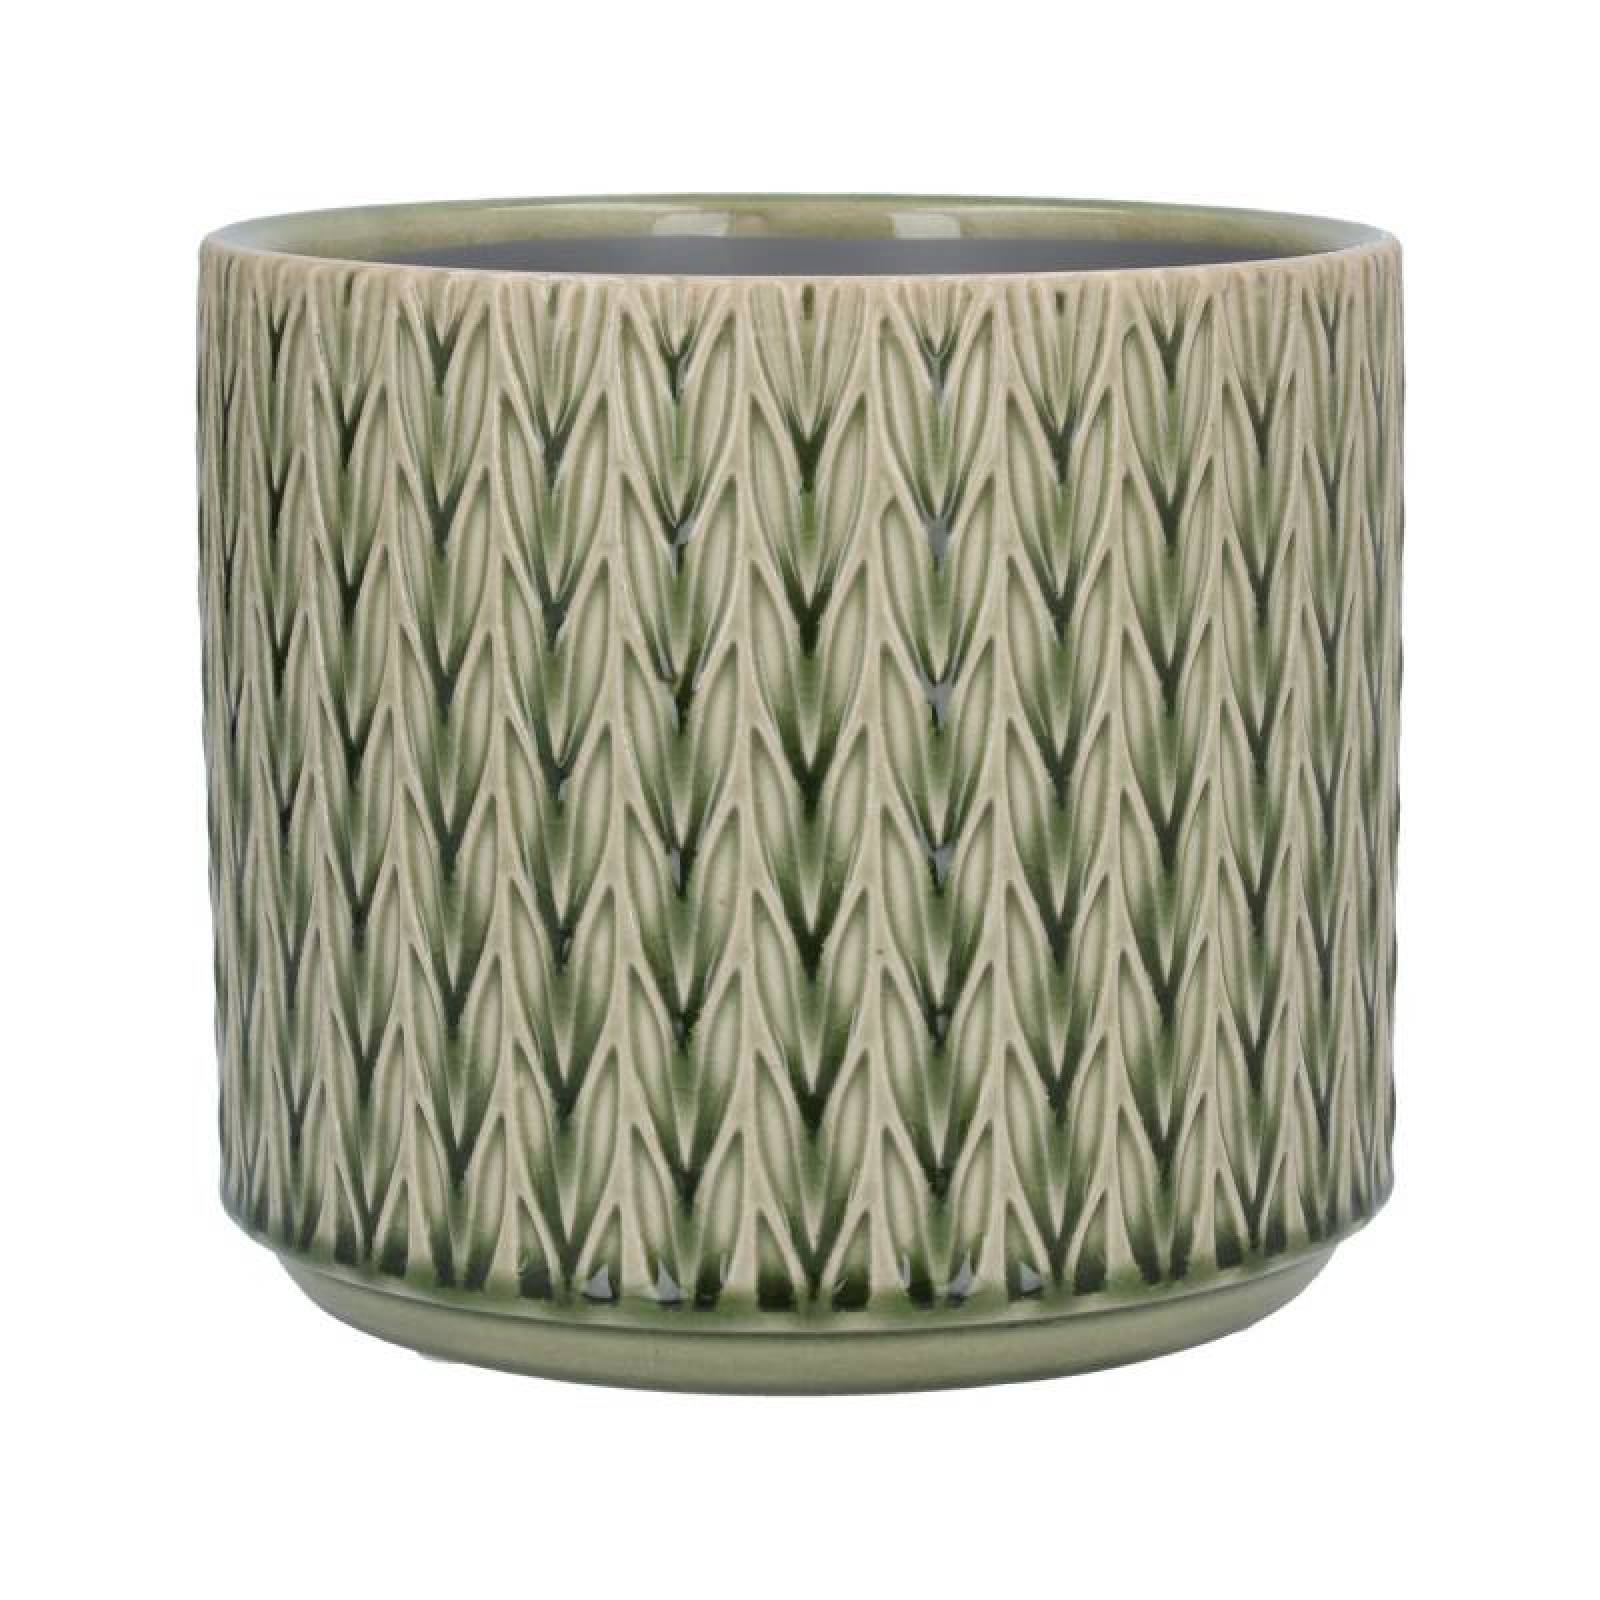 Medium Staghorn Ceramic Flowerpot Cover In Green